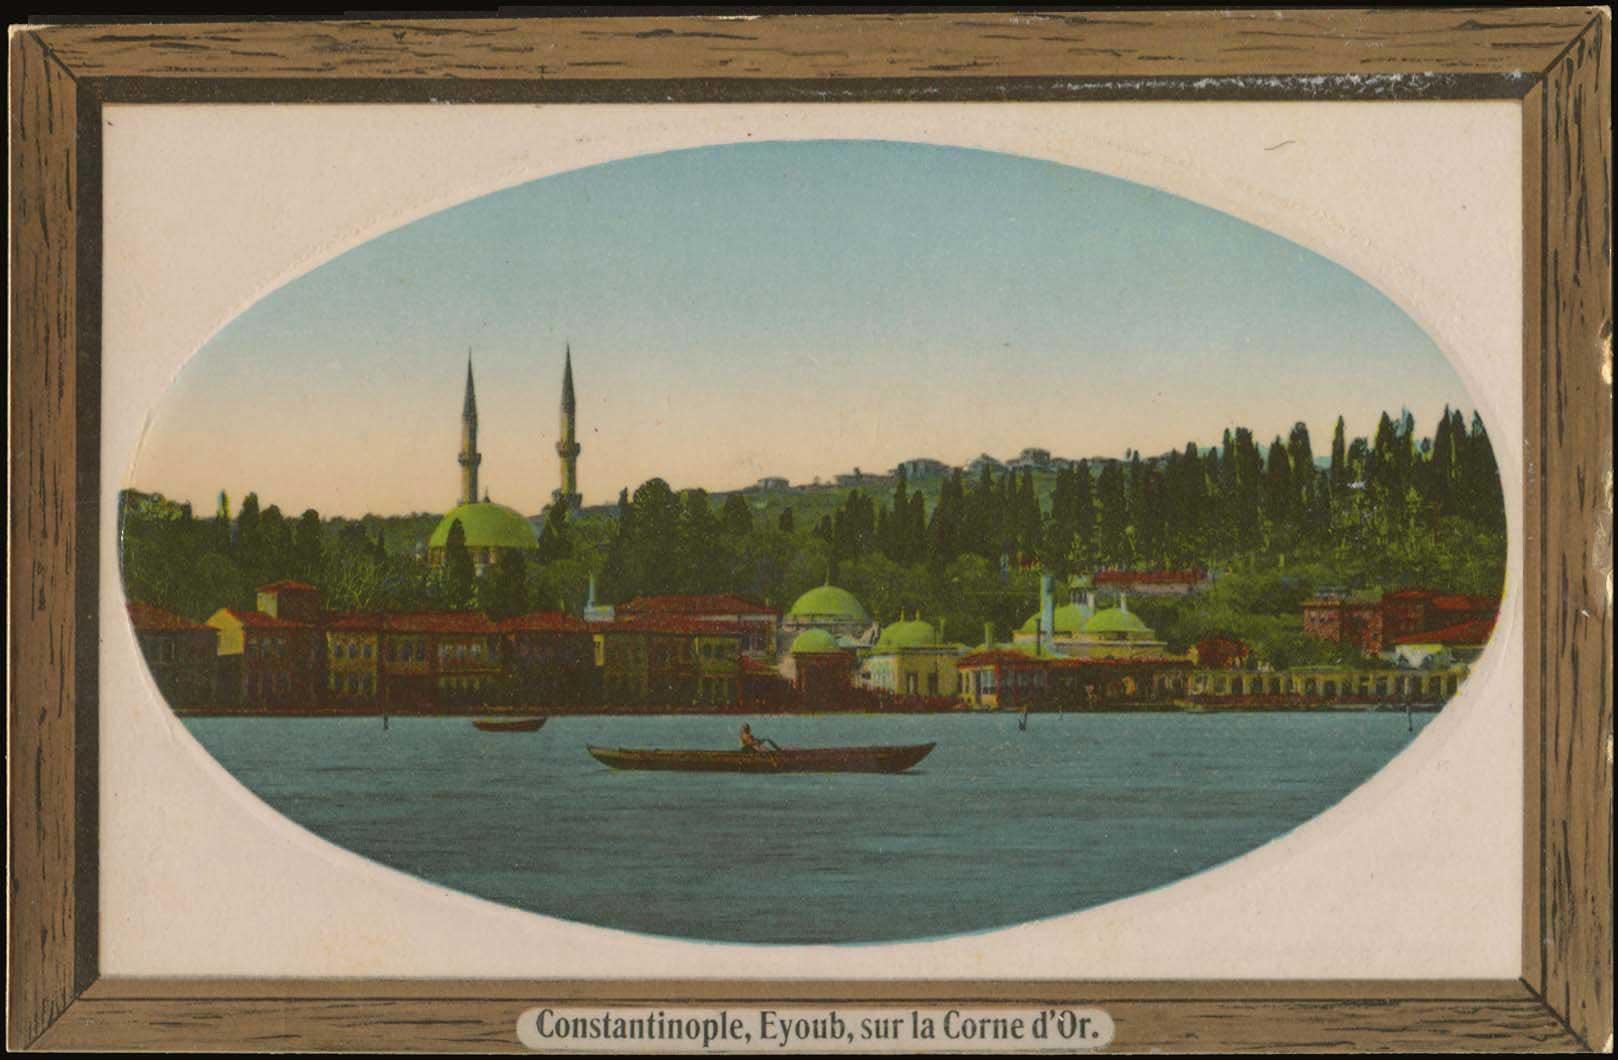 Lot 1721 - -  PICTURE POSTCARDS SMYRNE, CONSTANTINOPLE, ASIA MINOR -  A. Karamitsos Public & Live Internet Auction 675